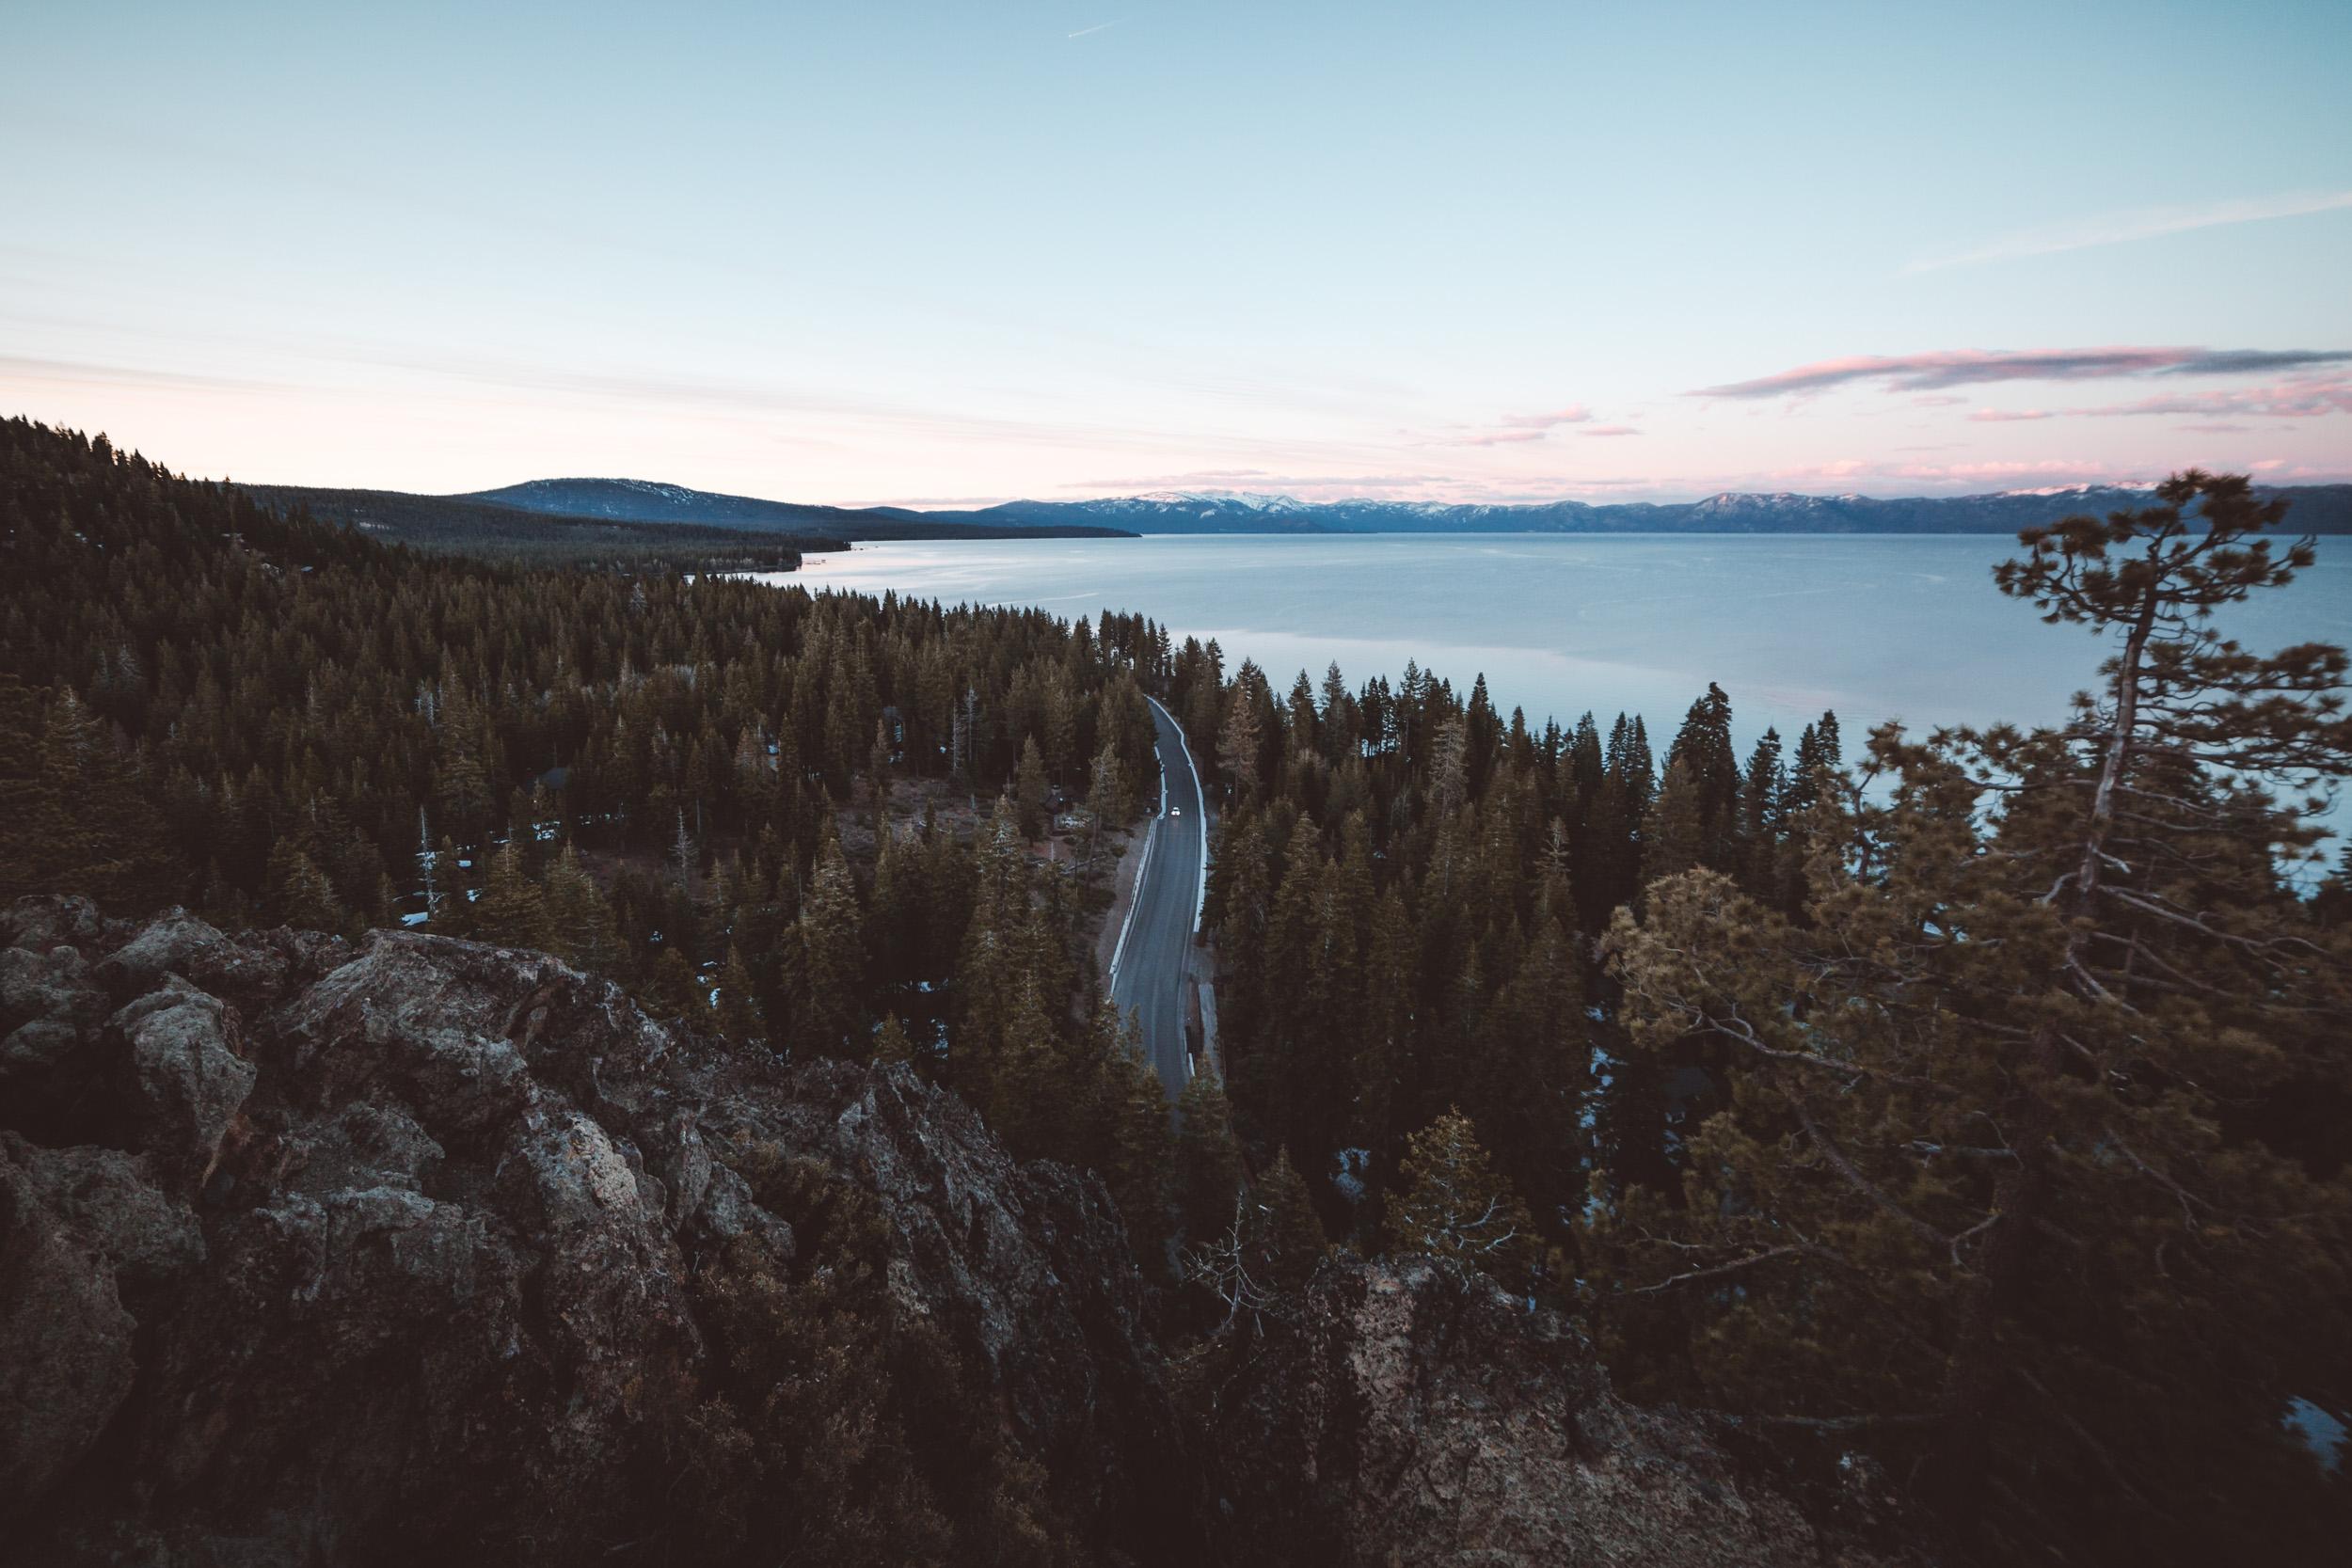 west-shore-adventure-eagle-rock-vista-hike-and-shoot-1.jpg